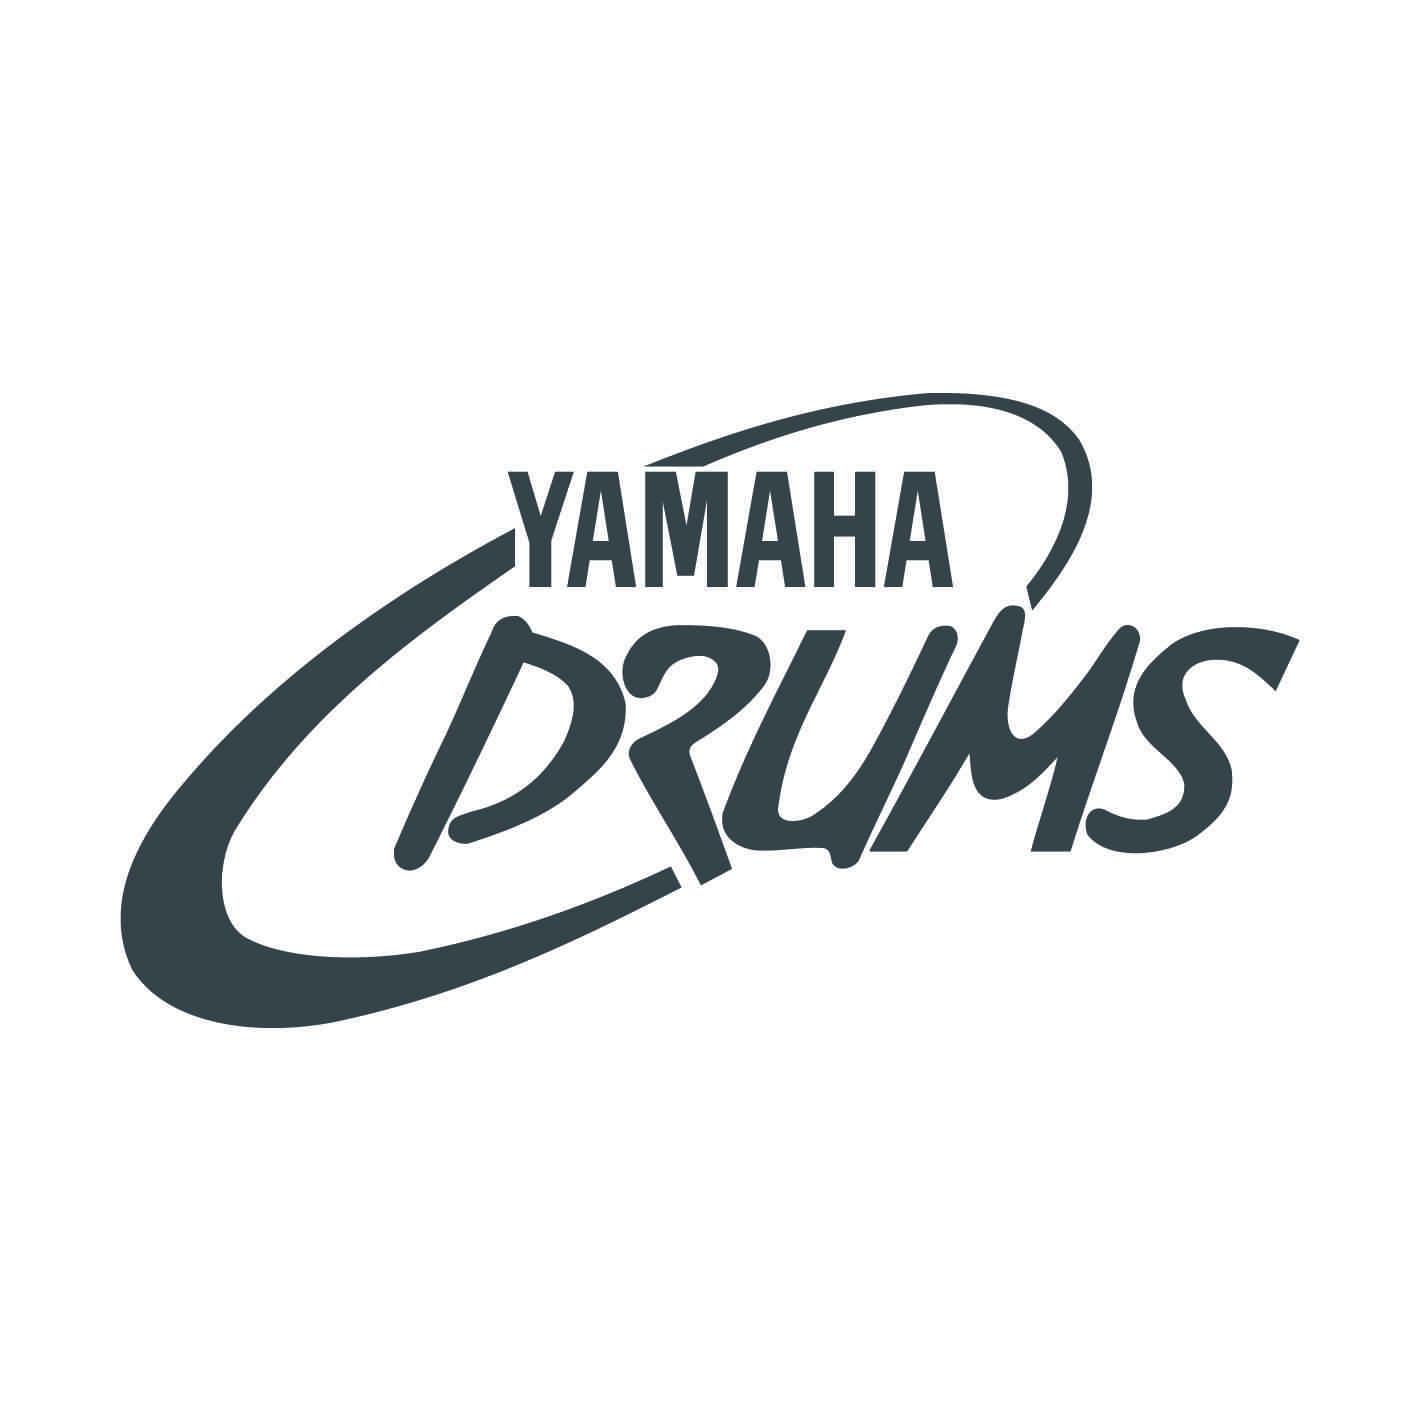 yamaha-ref19-vdrum-stickers-moto-casque-scooter-sticker-autocollant-adhesifs